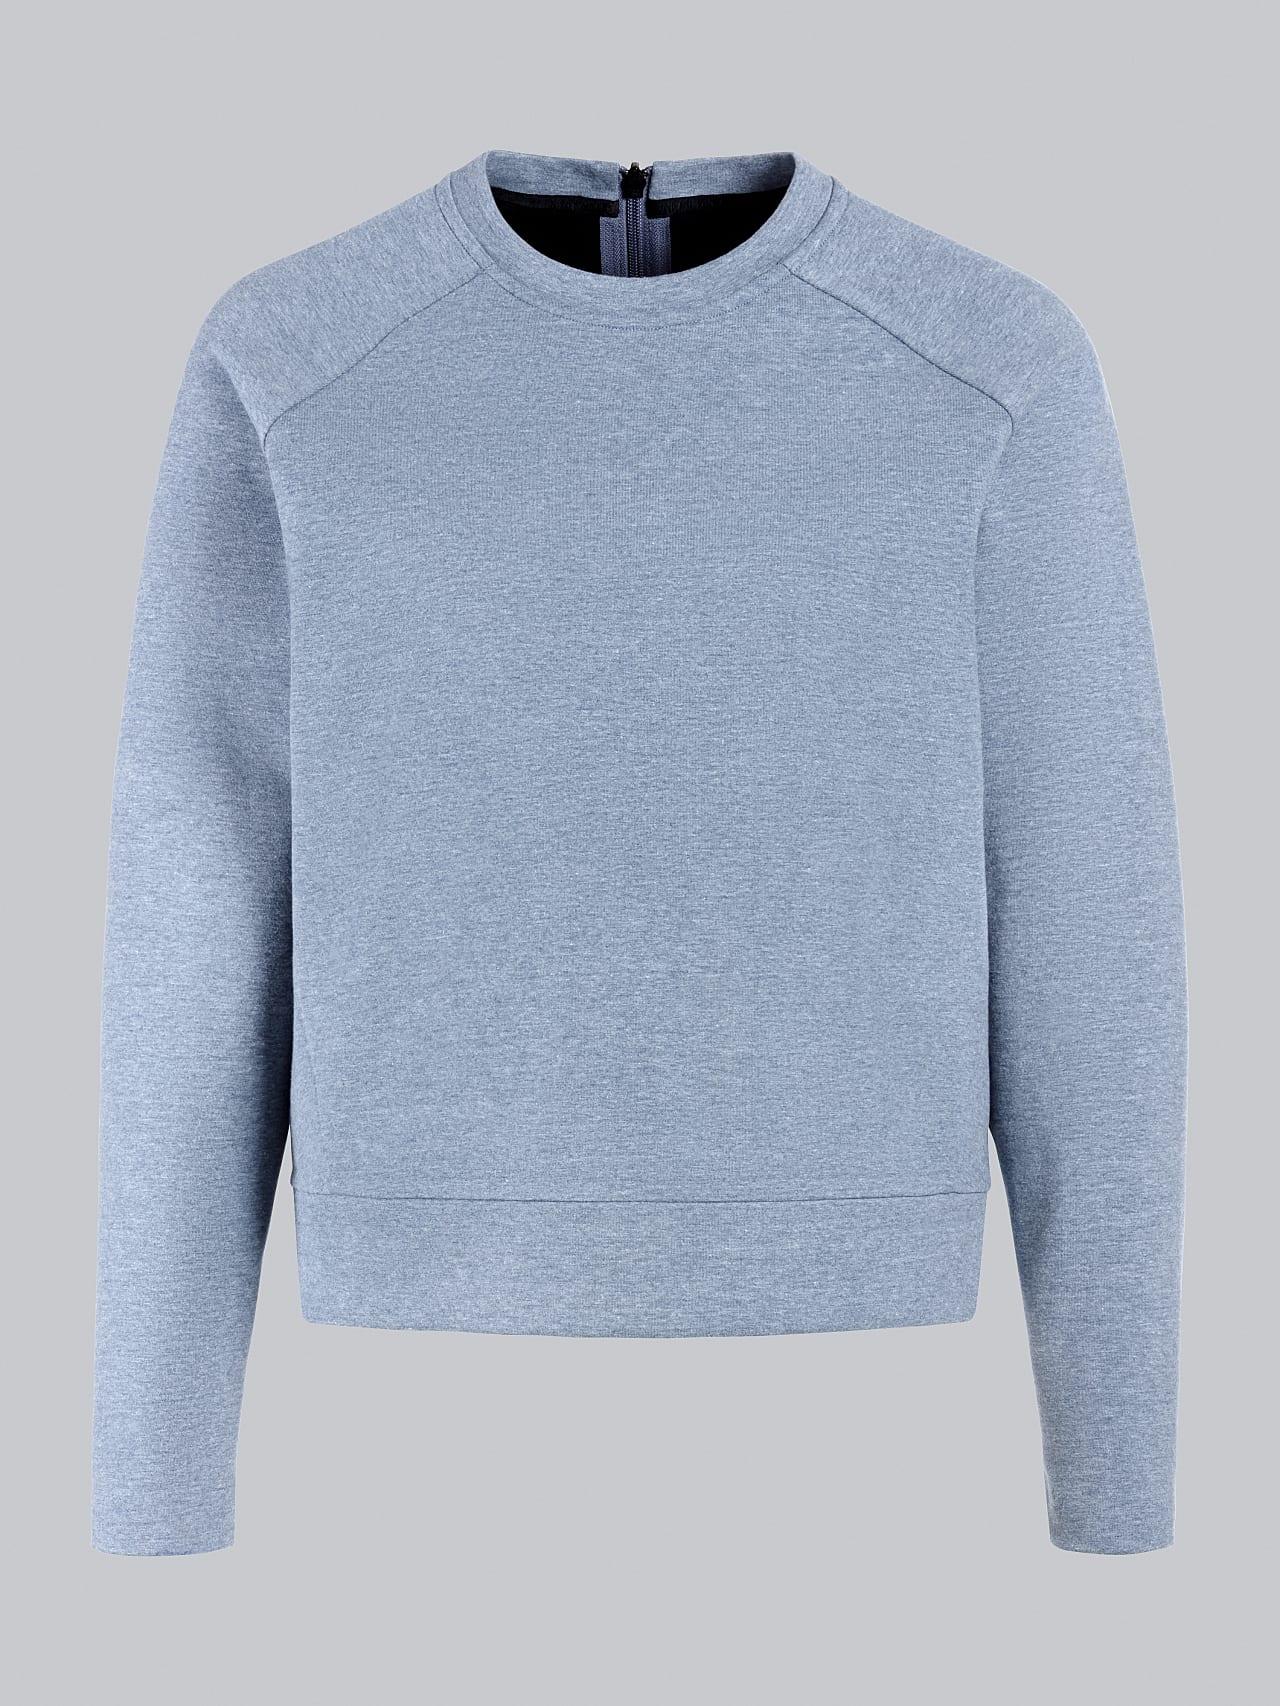 SRONI V2.Y5.02 Waterproof Sweatshirt medium blue Back Alpha Tauri